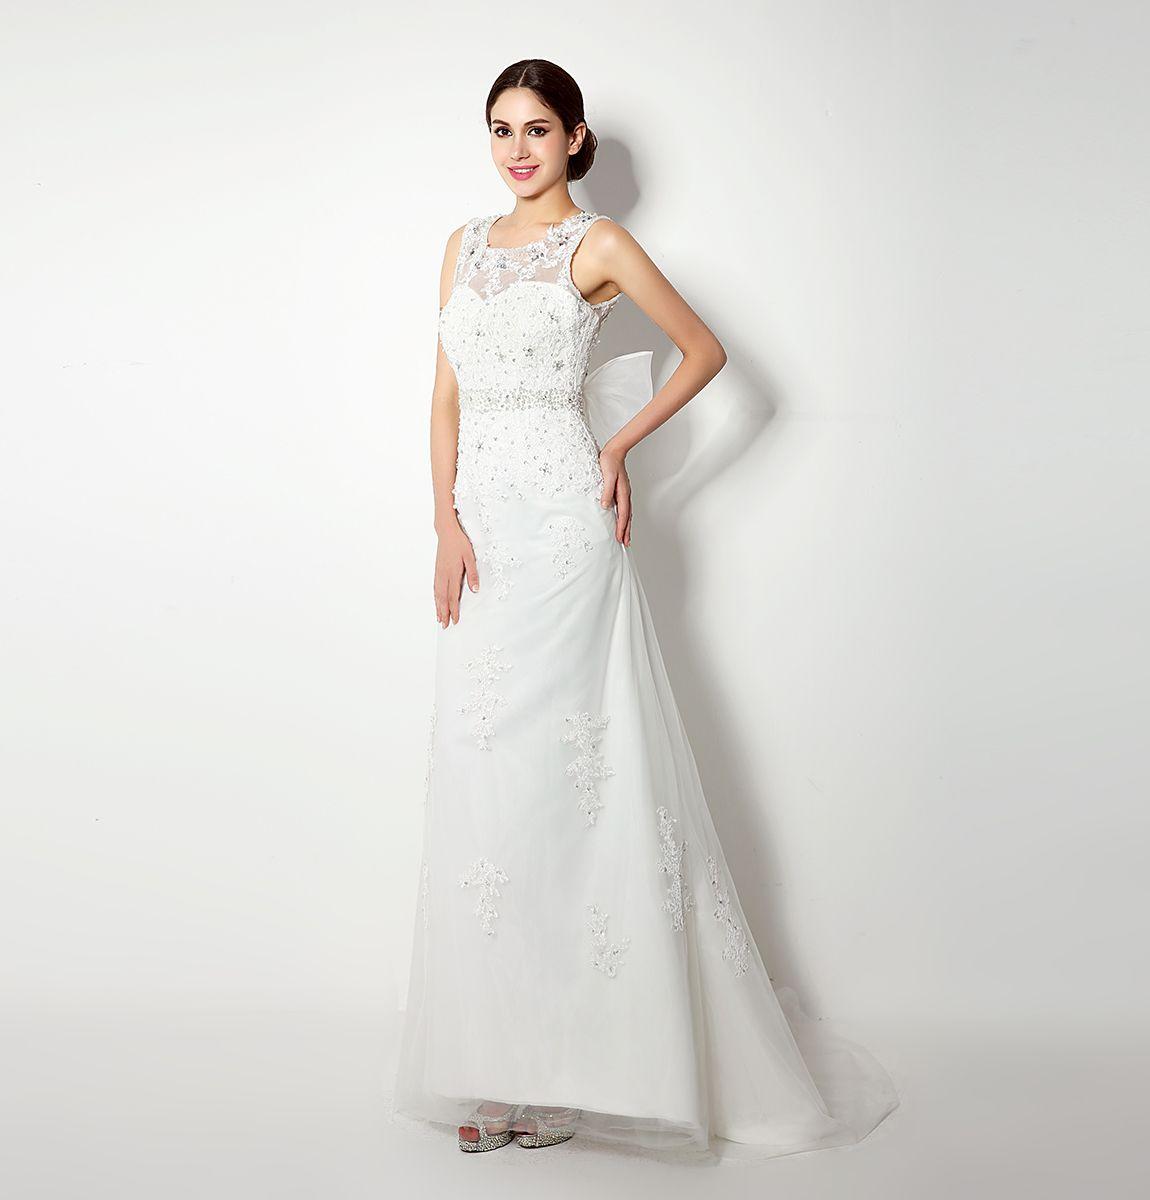 I lager sjöjungfru spetsar bröllopsklänningar med stor båge 2018 billig vit / elfenben brudklänningar applikationer kristall bröllopsklänning gratis frakt 32239